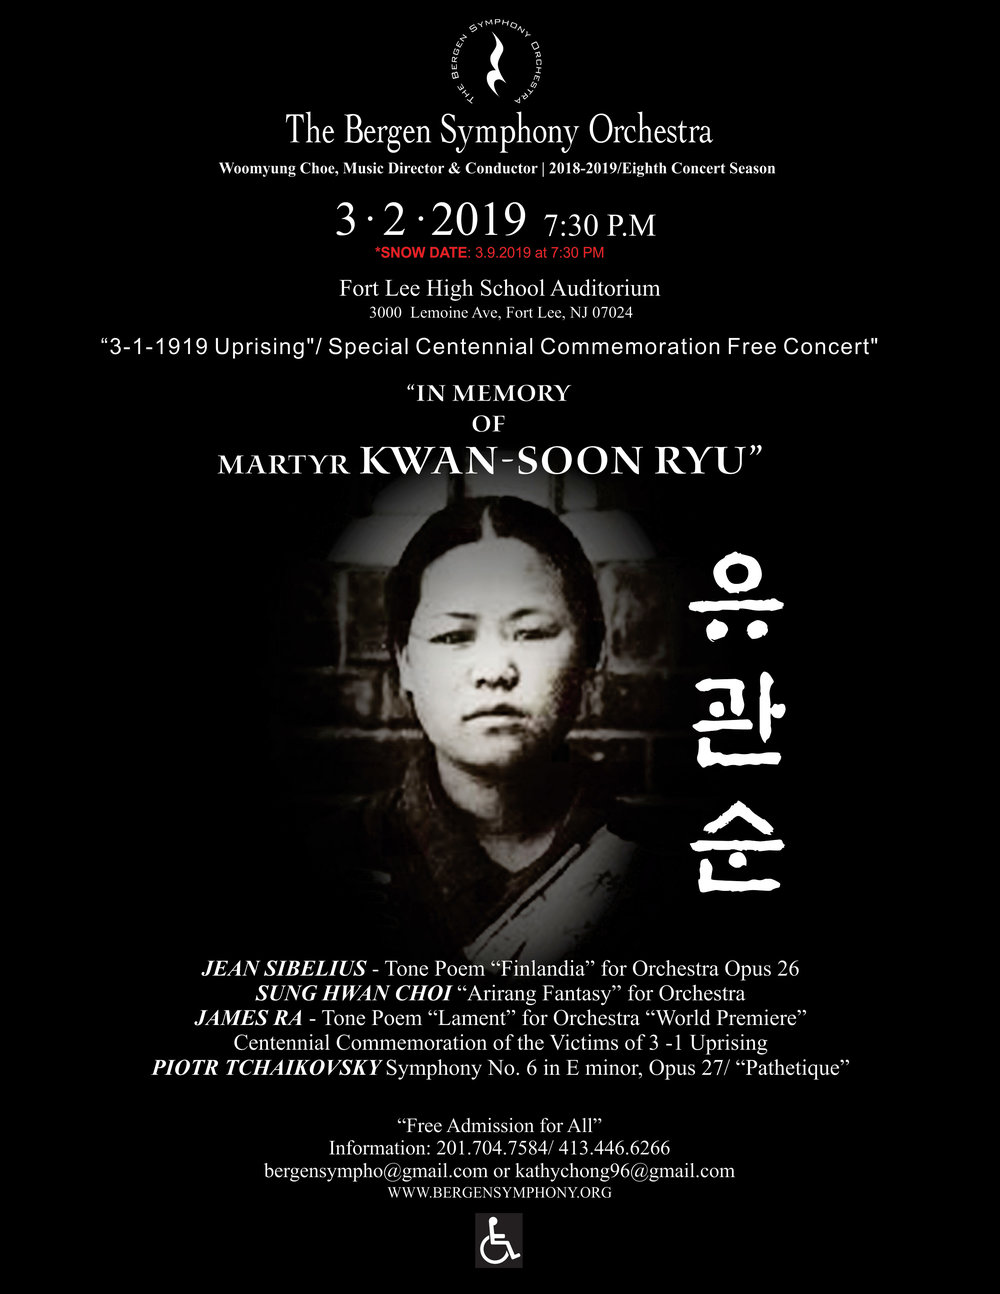 Finalnew-ryu-kwan-soon-poster.jpg